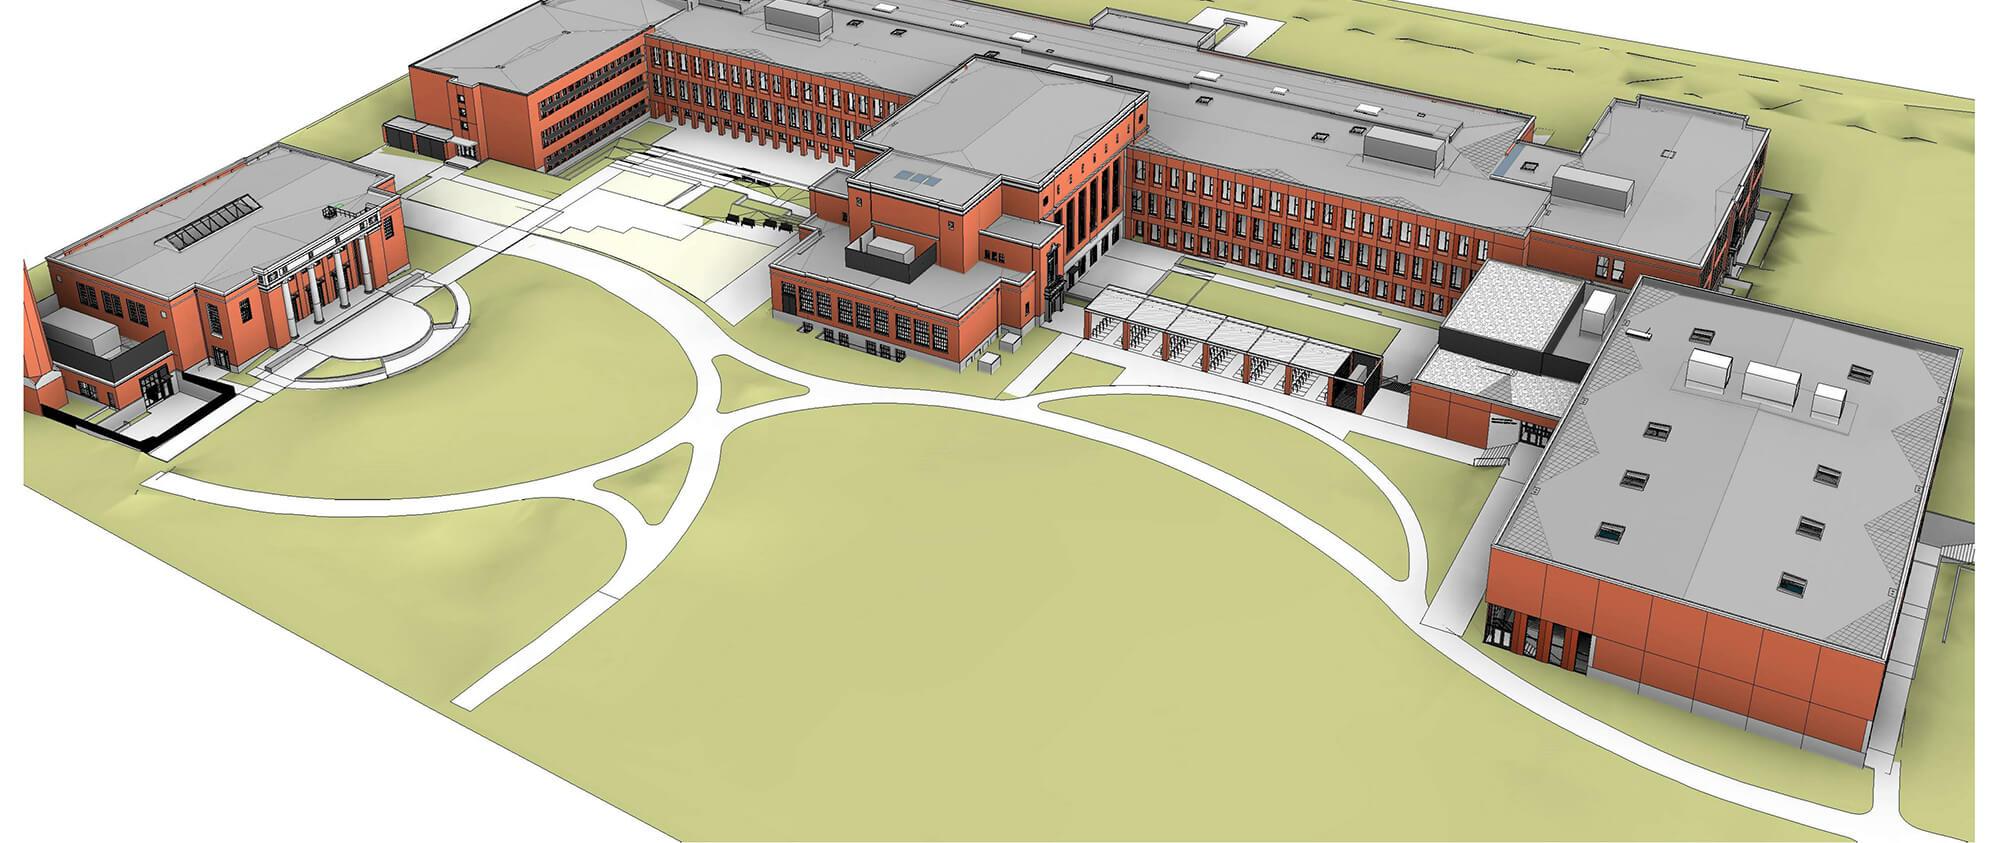 grant high school modernization